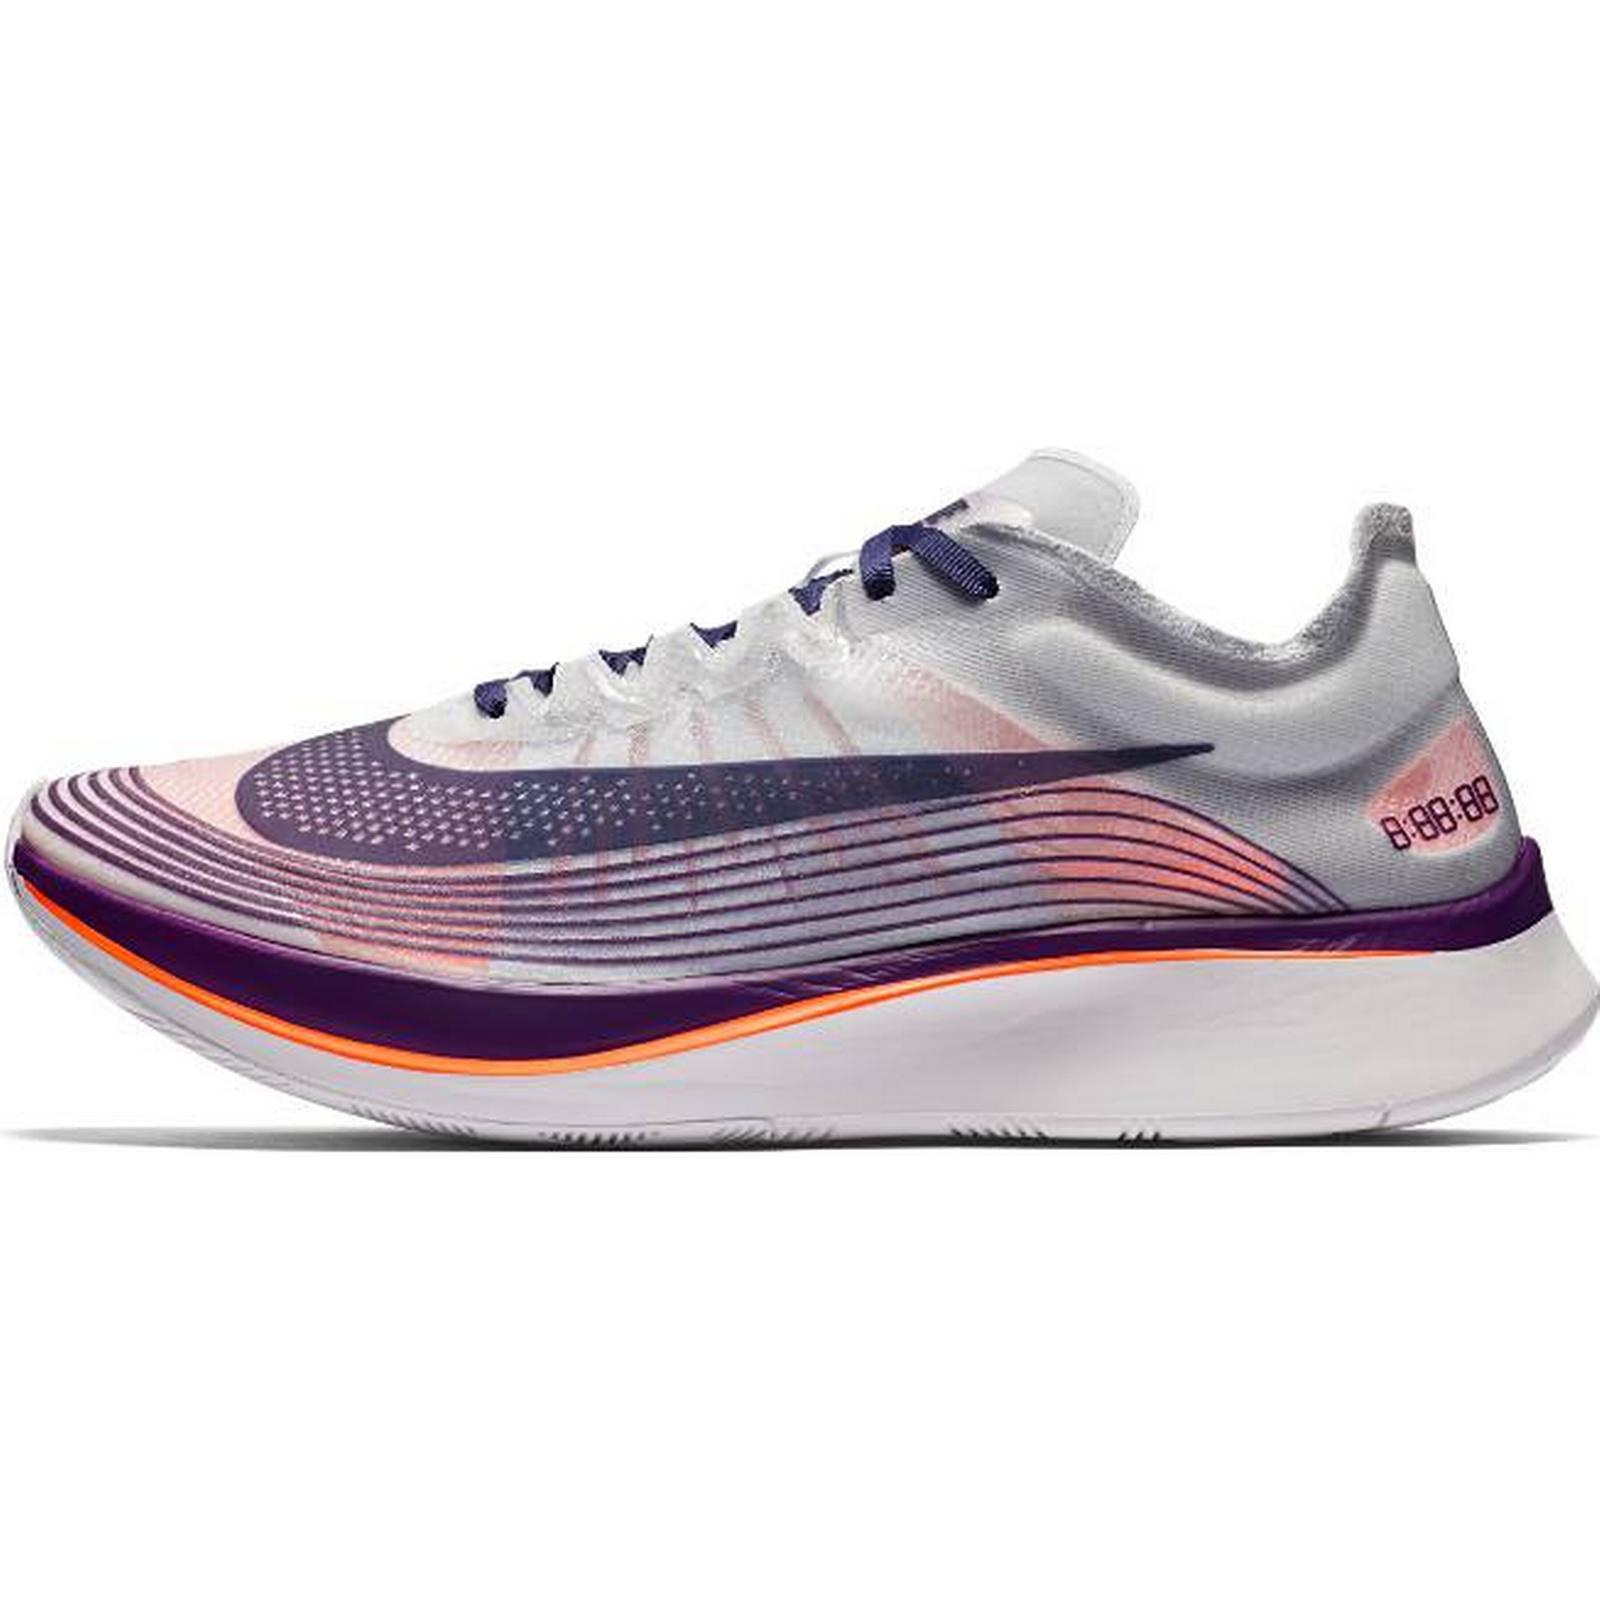 NIKE Nike Buty Do Biegania Uniseks Nike NIKE Zoom Fly SP c163de